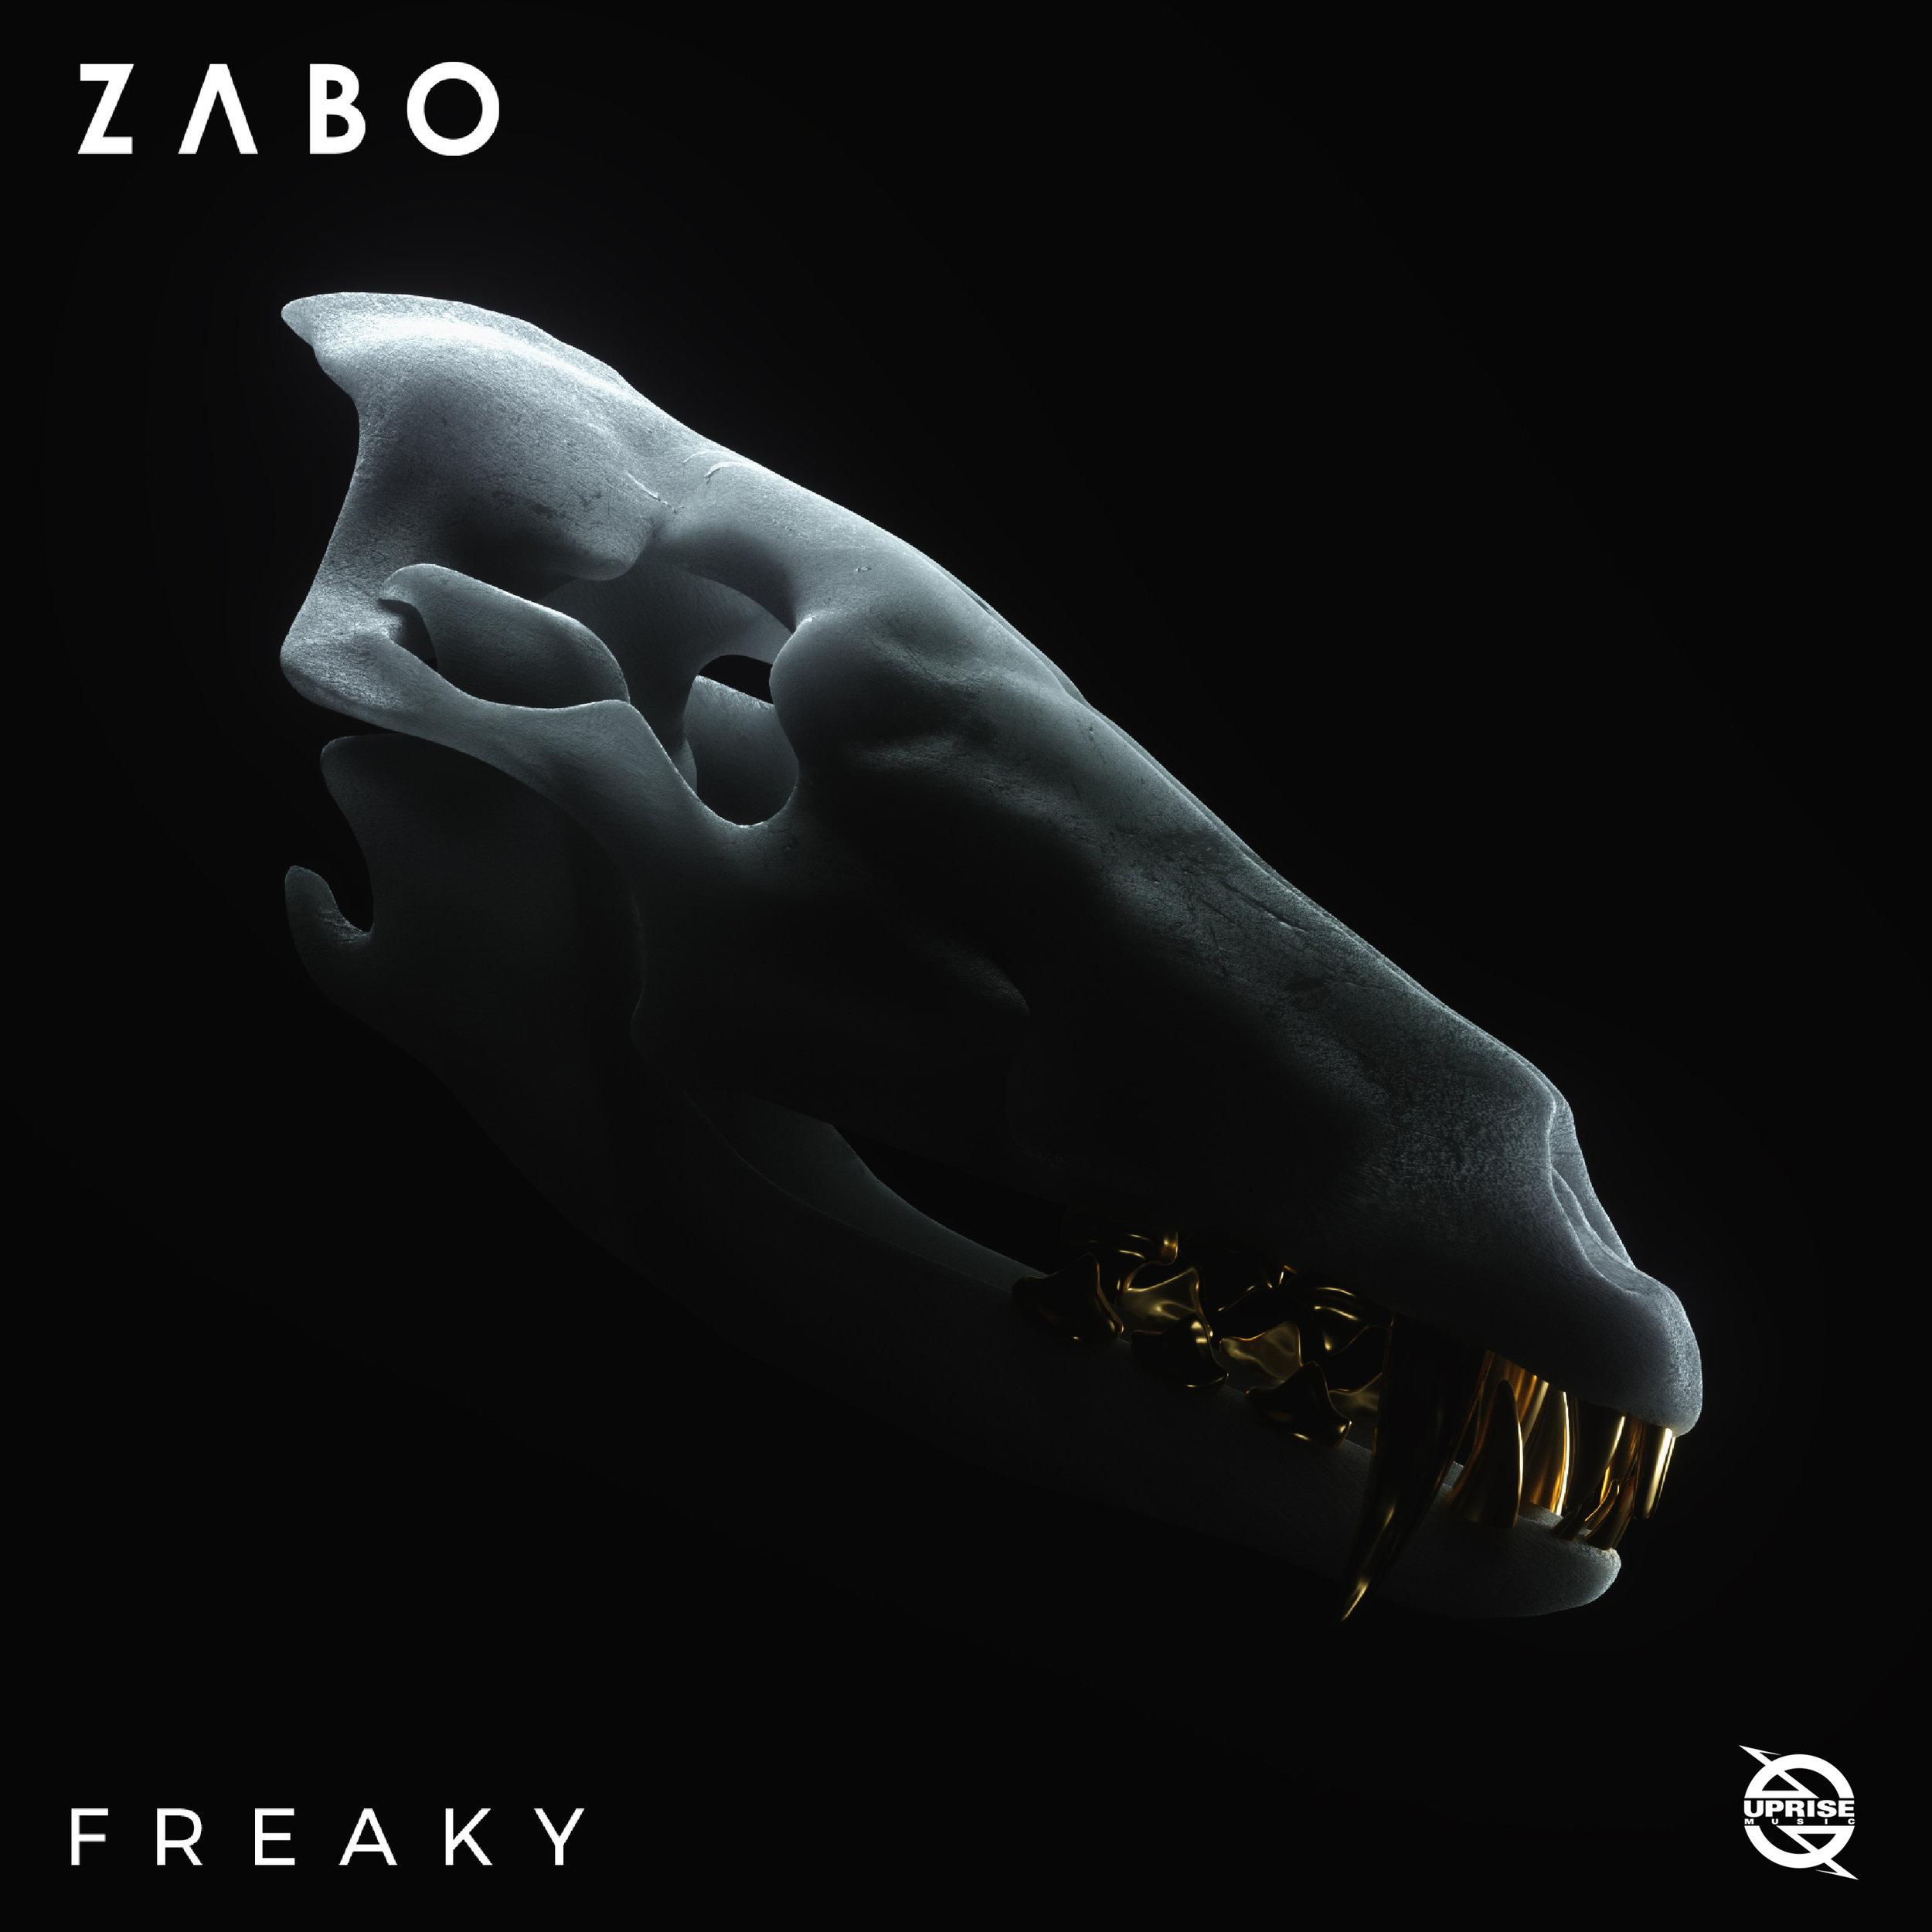 ZABO - Freaky